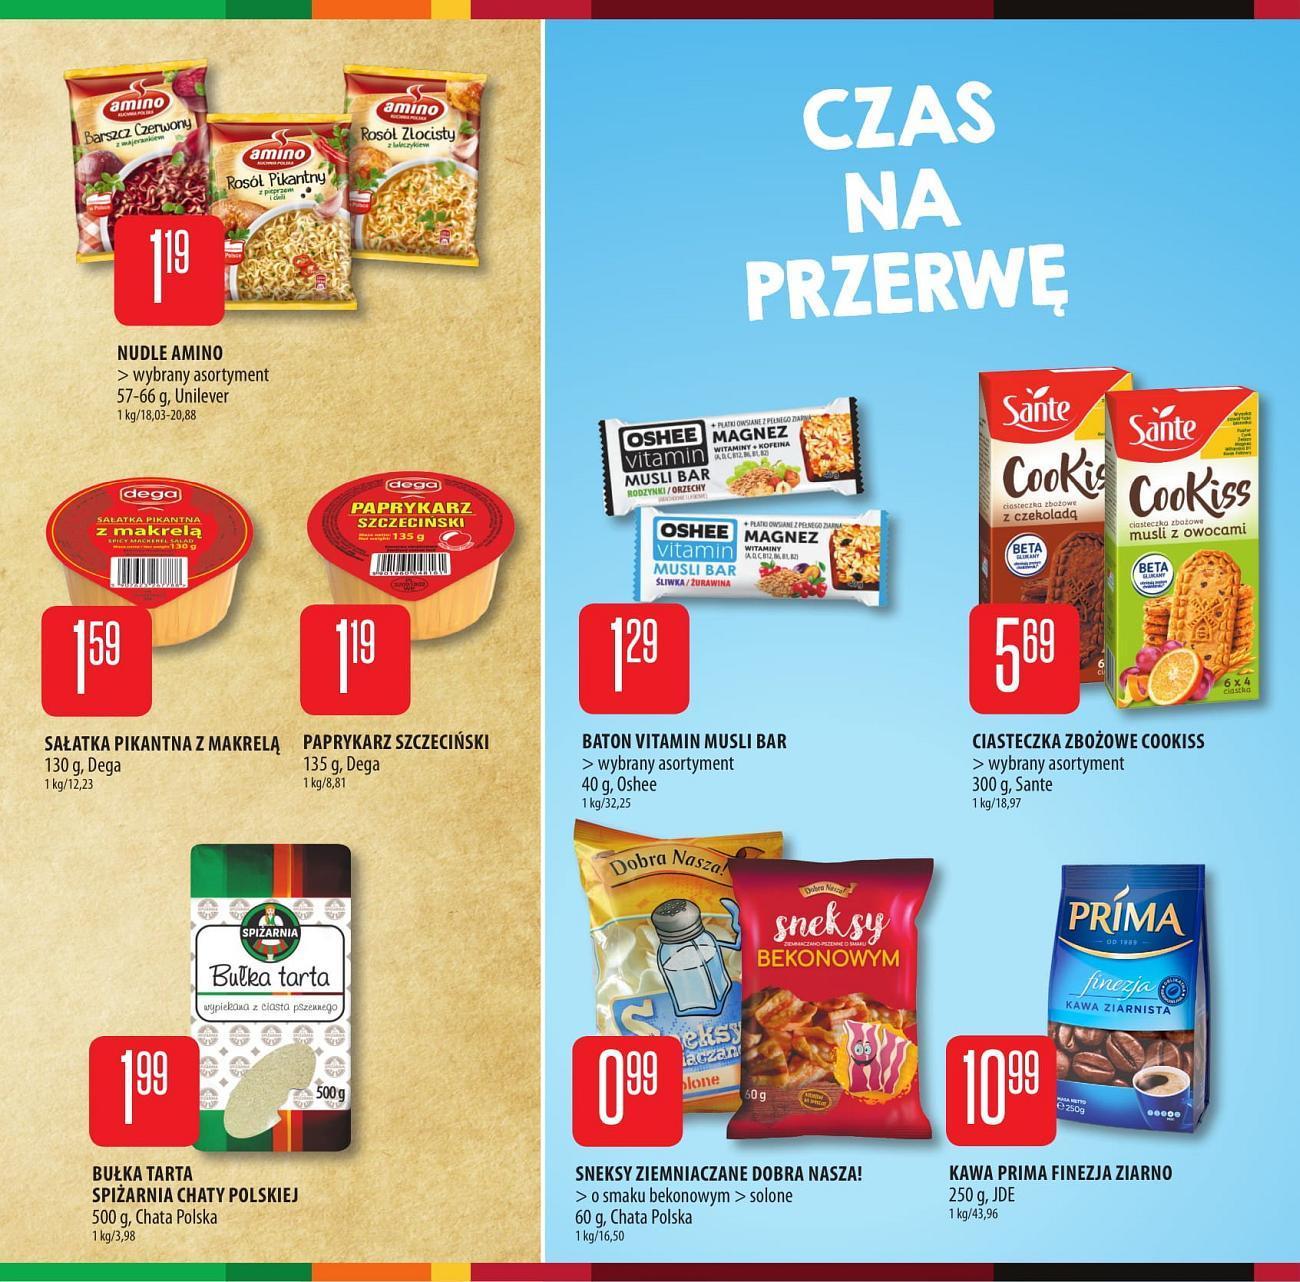 Gazetka promocyjna Chata Polska do 29/08/2018 str.4